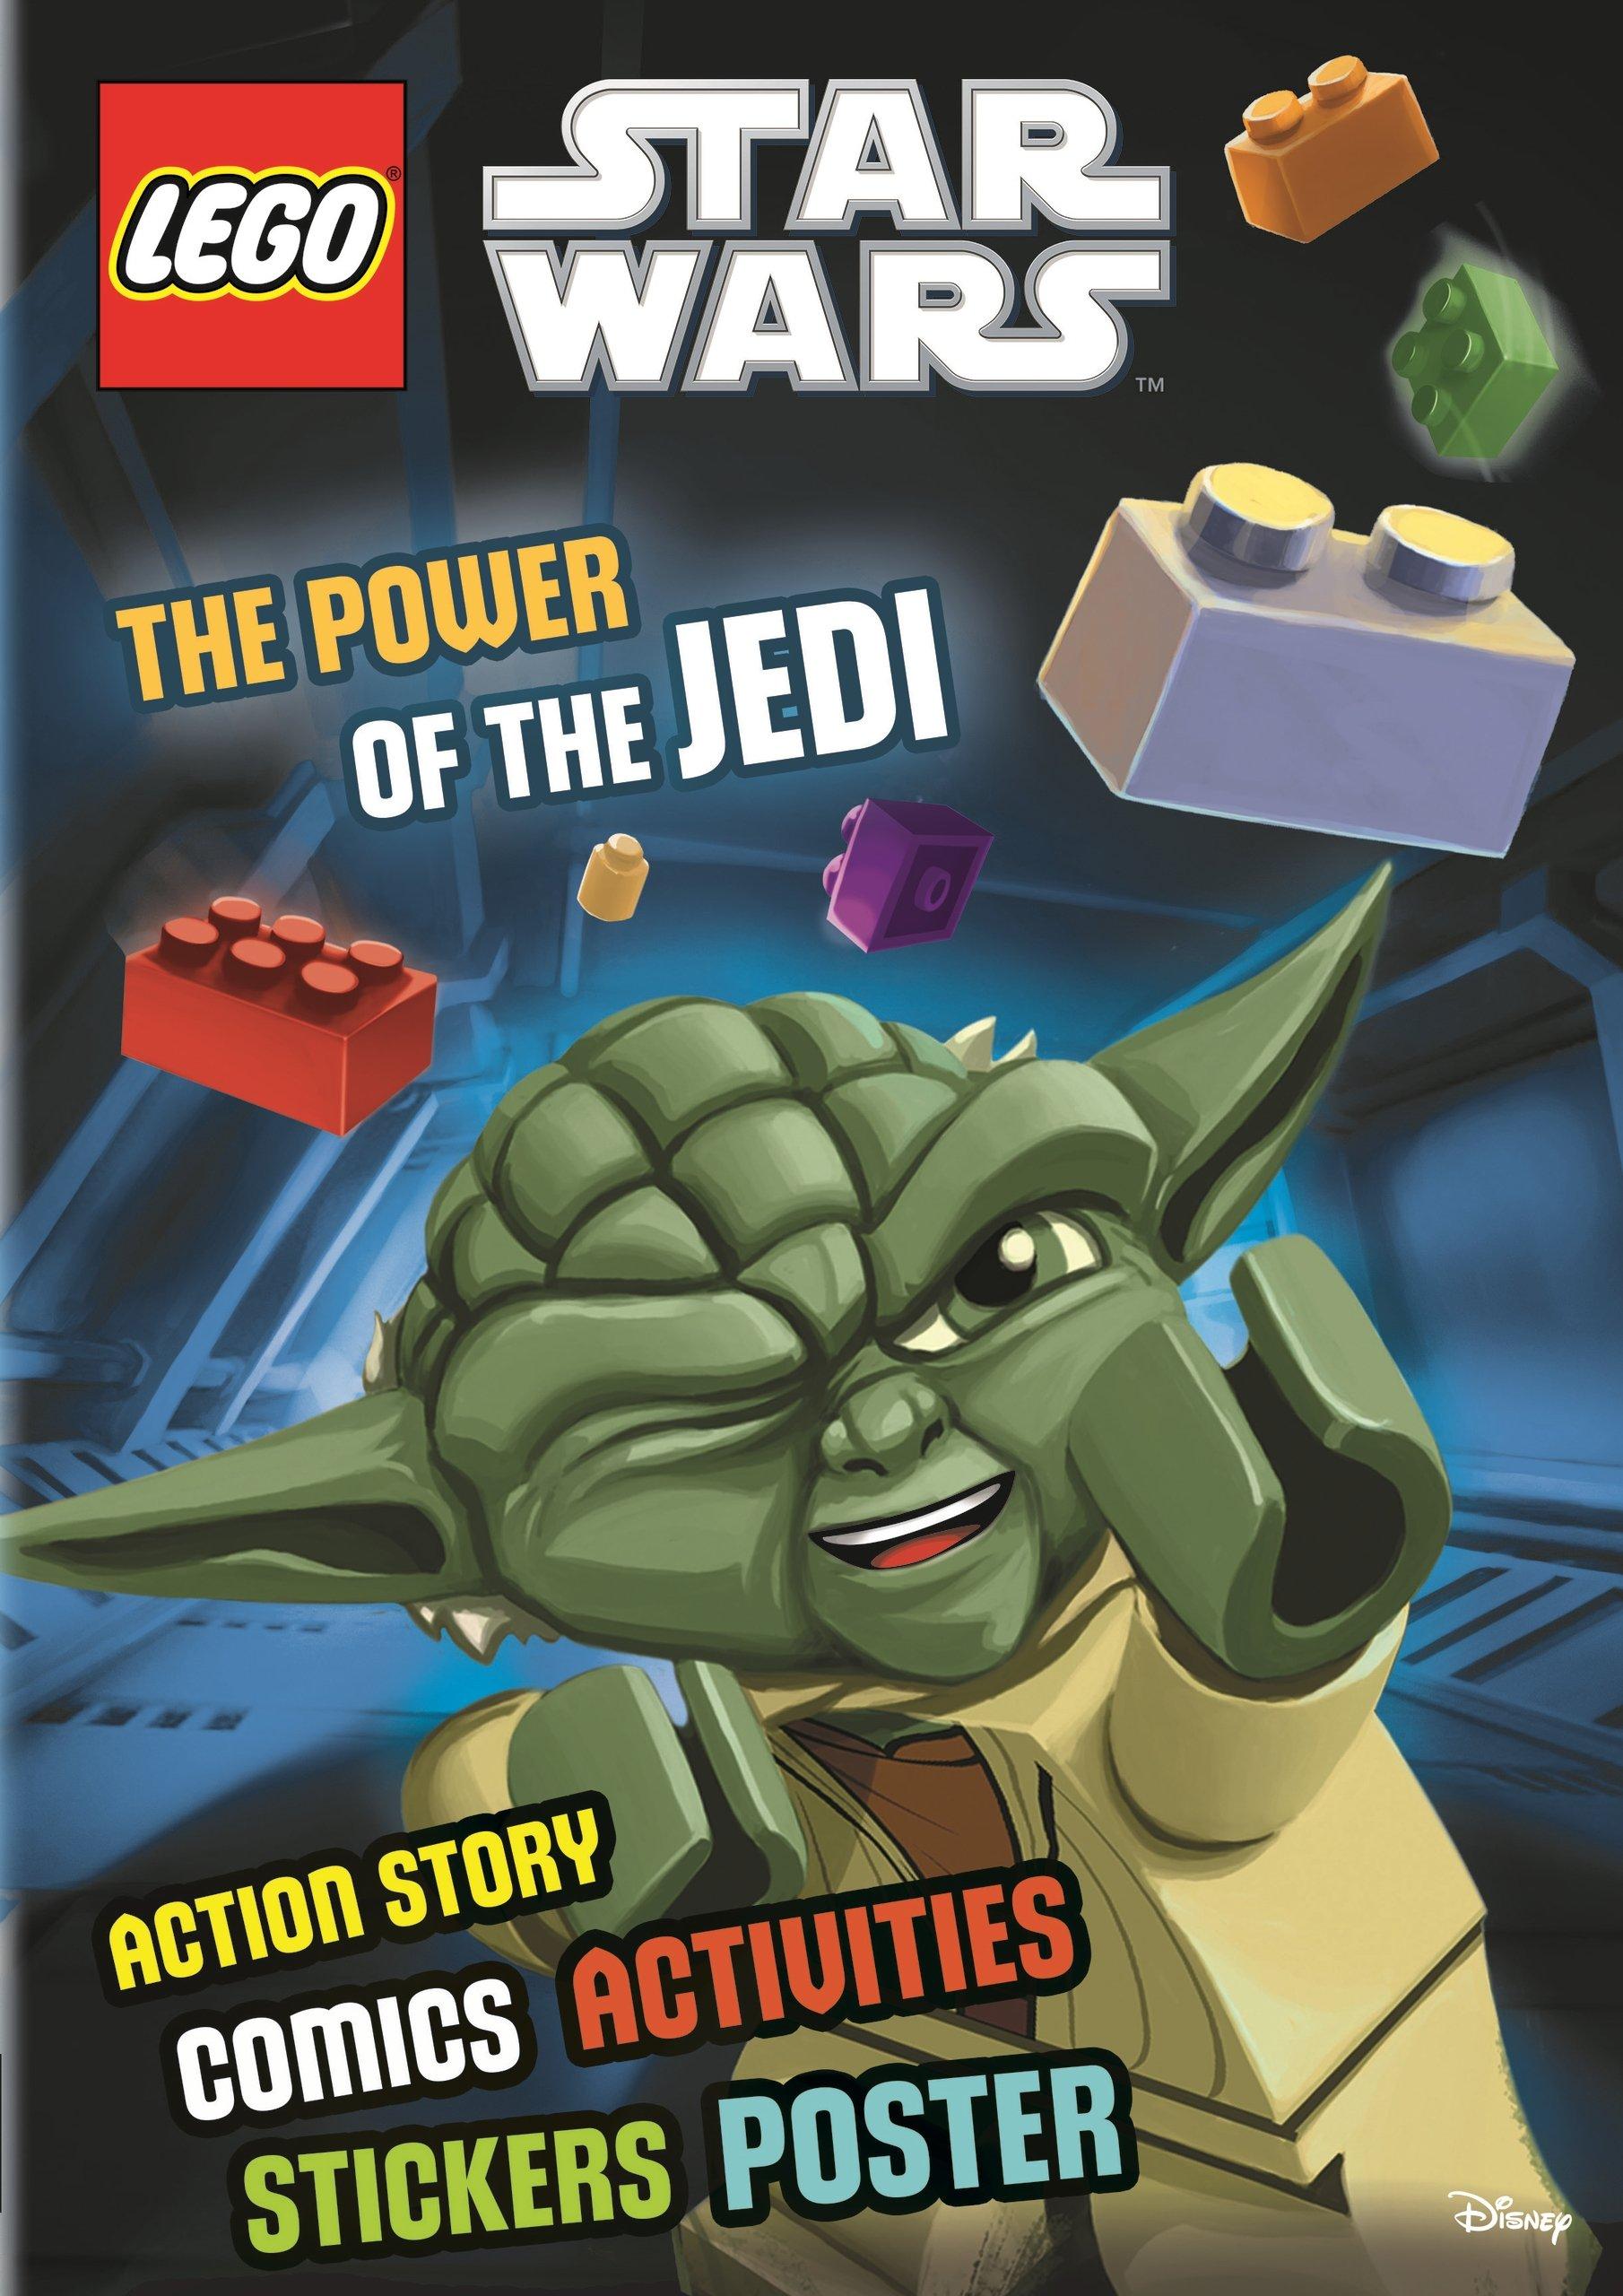 02cd65d59bdc LEGO Star Wars: The Power of the Jedi | Wookieepedia | FANDOM ...